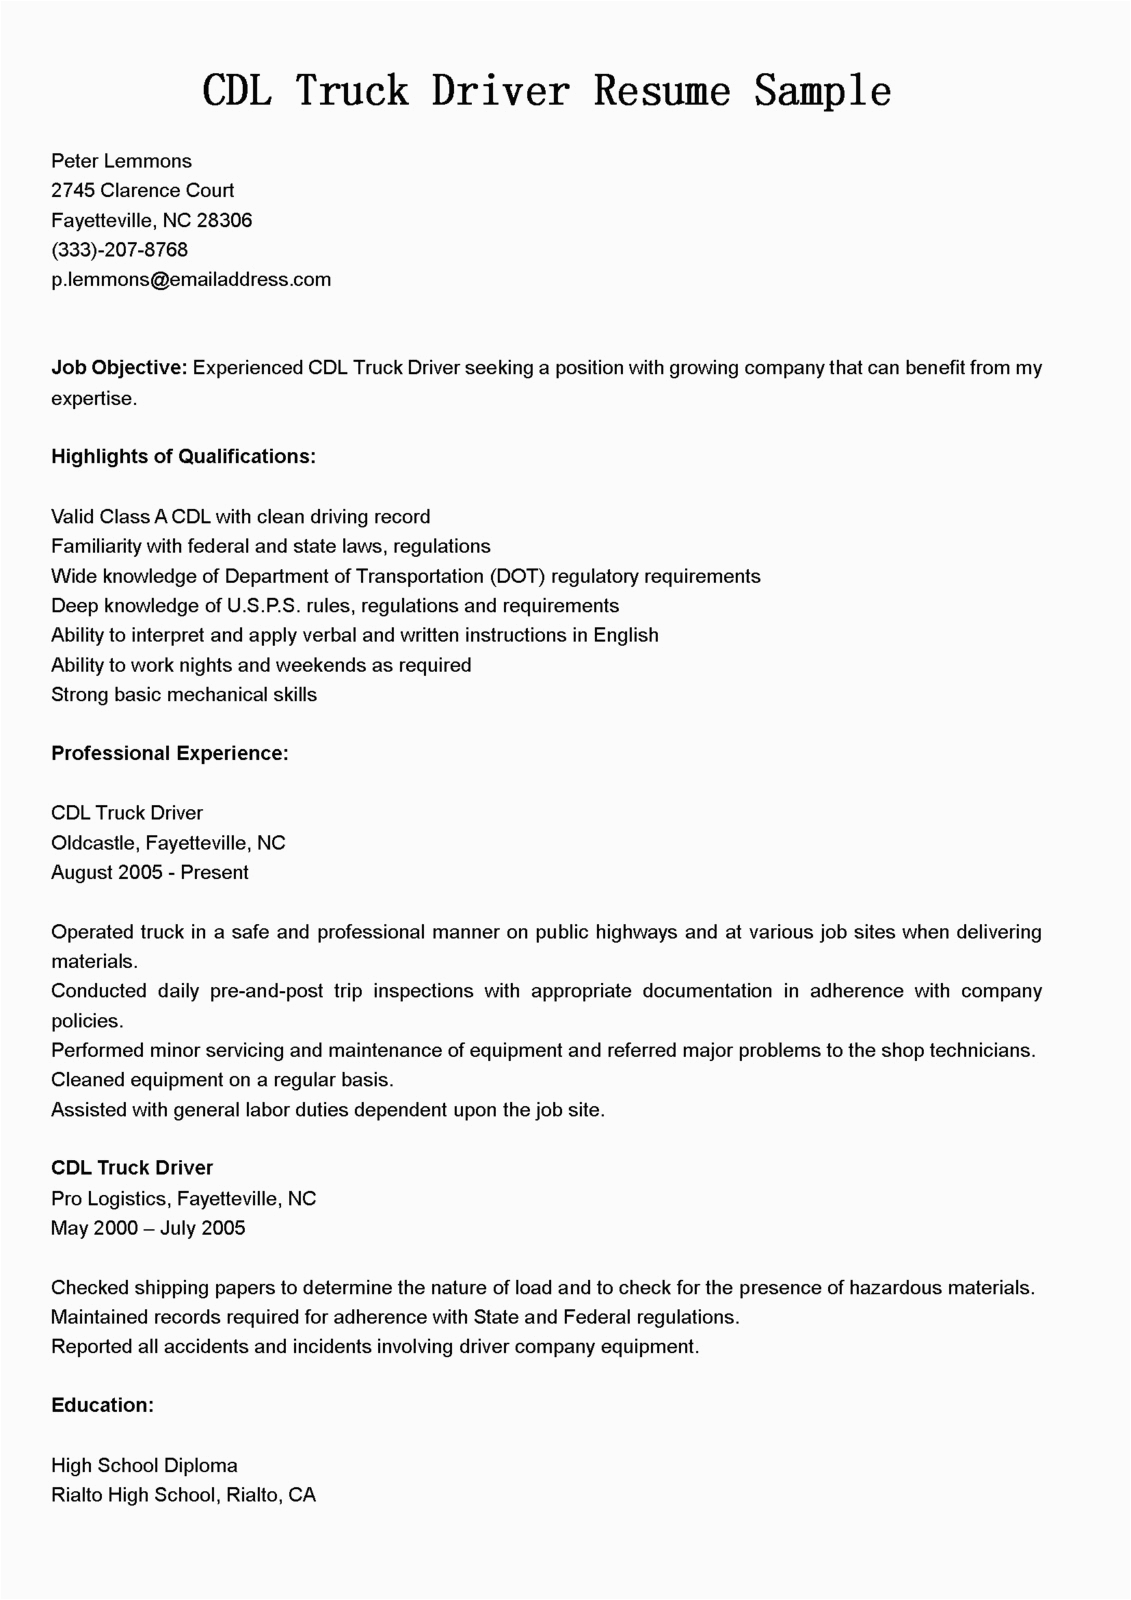 cdl truck driver resume sample